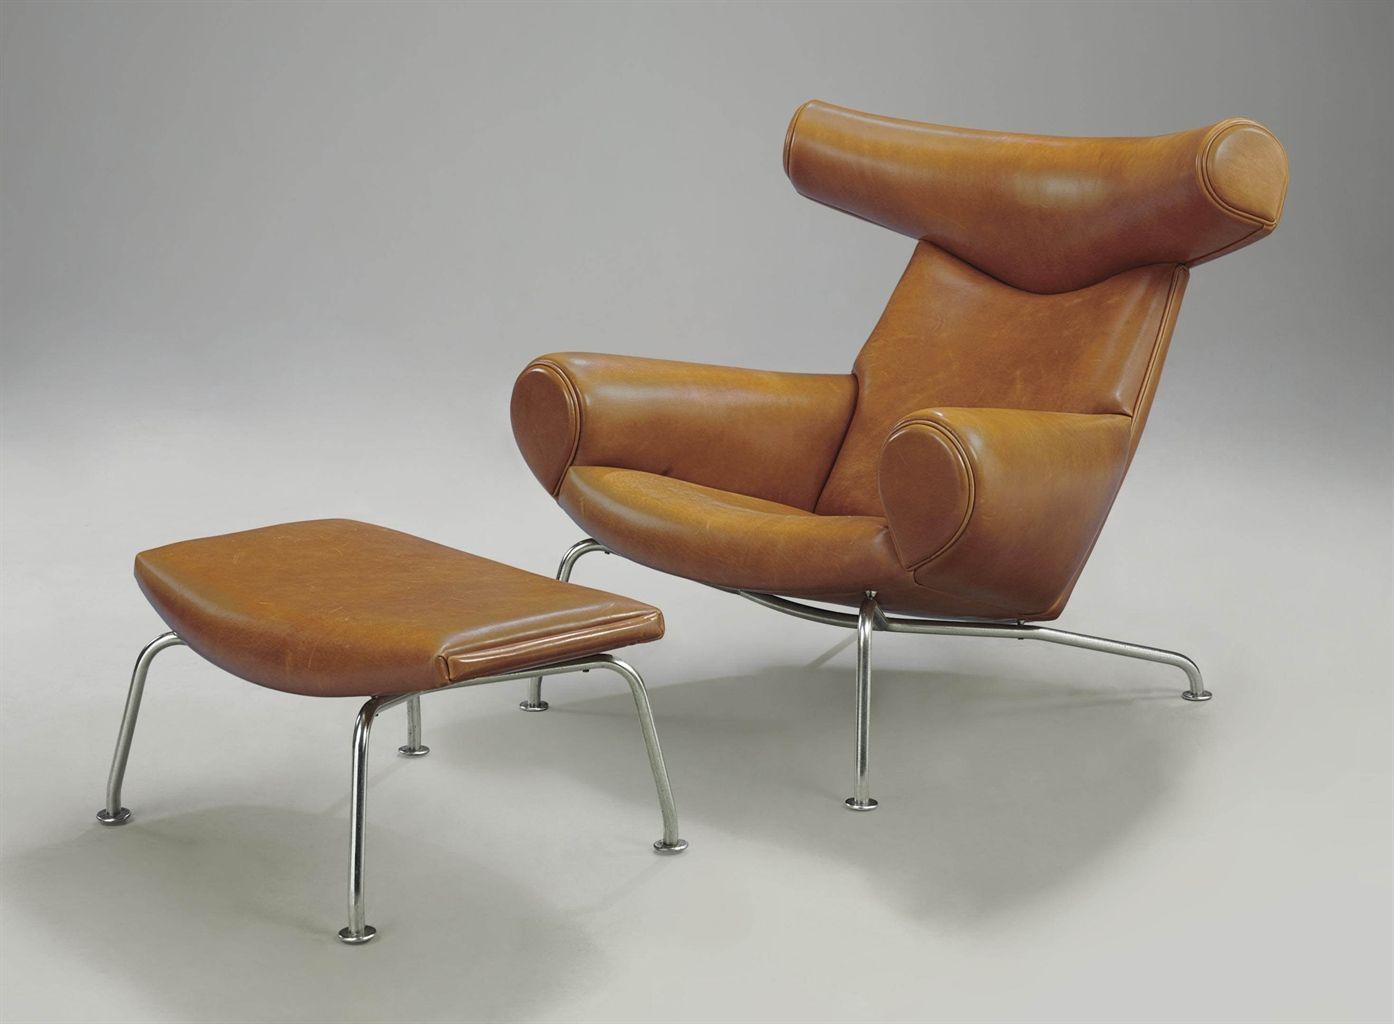 Hans J Wegner for Johannes Hansen Ox lounge chair and Ottoman